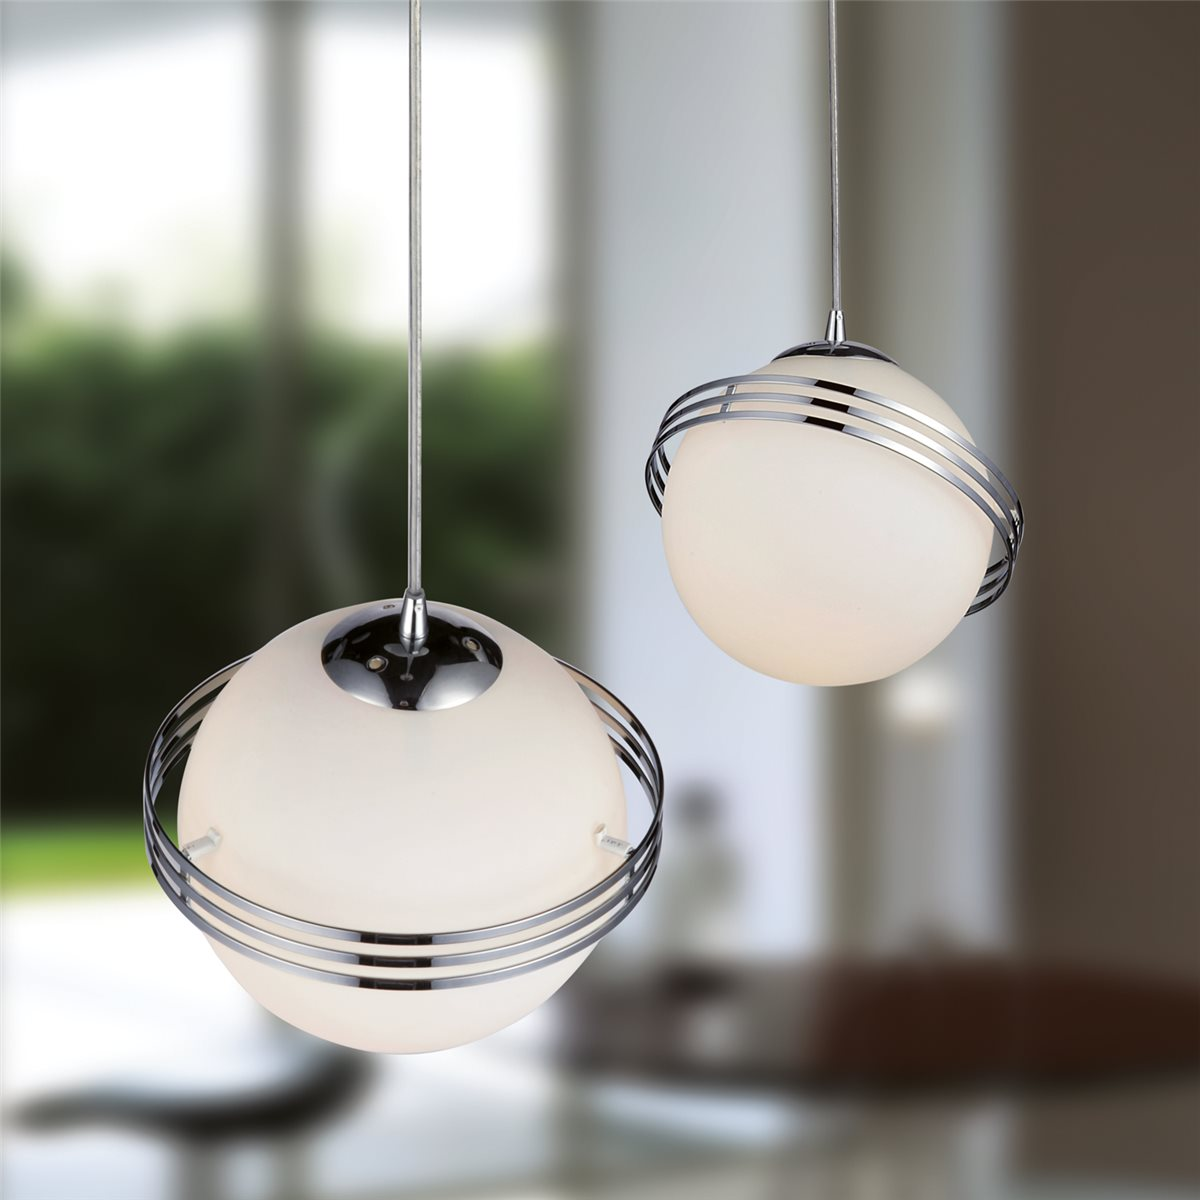 Lampenlux LED Pendelleuchte Bieno Hängeleuchte Effektlampe Glas Opal Weiß Kugellampe Ring